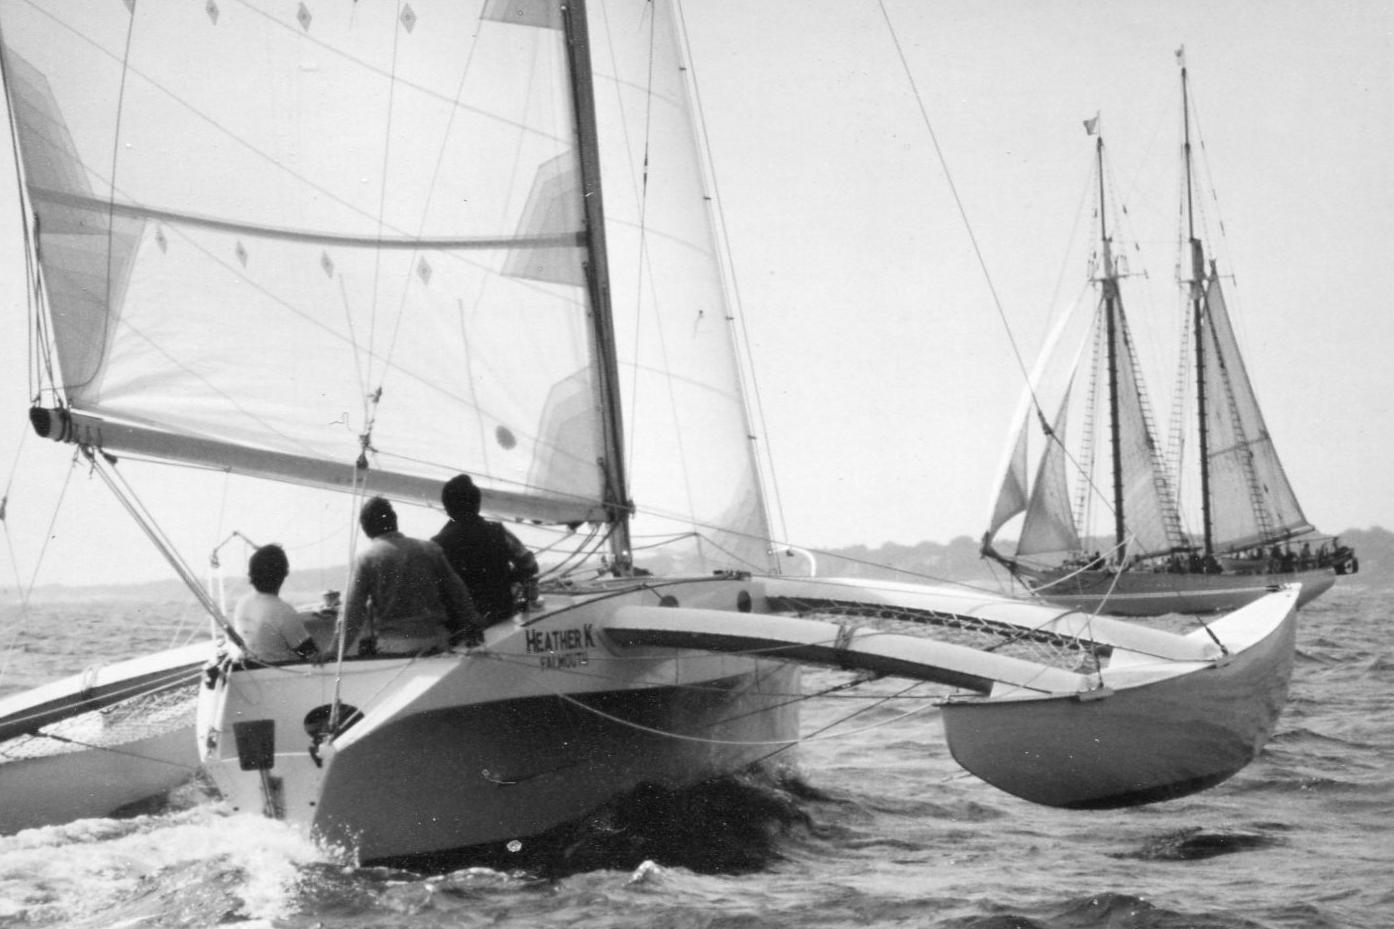 Multihull Boat - Heather K, Newick 30'